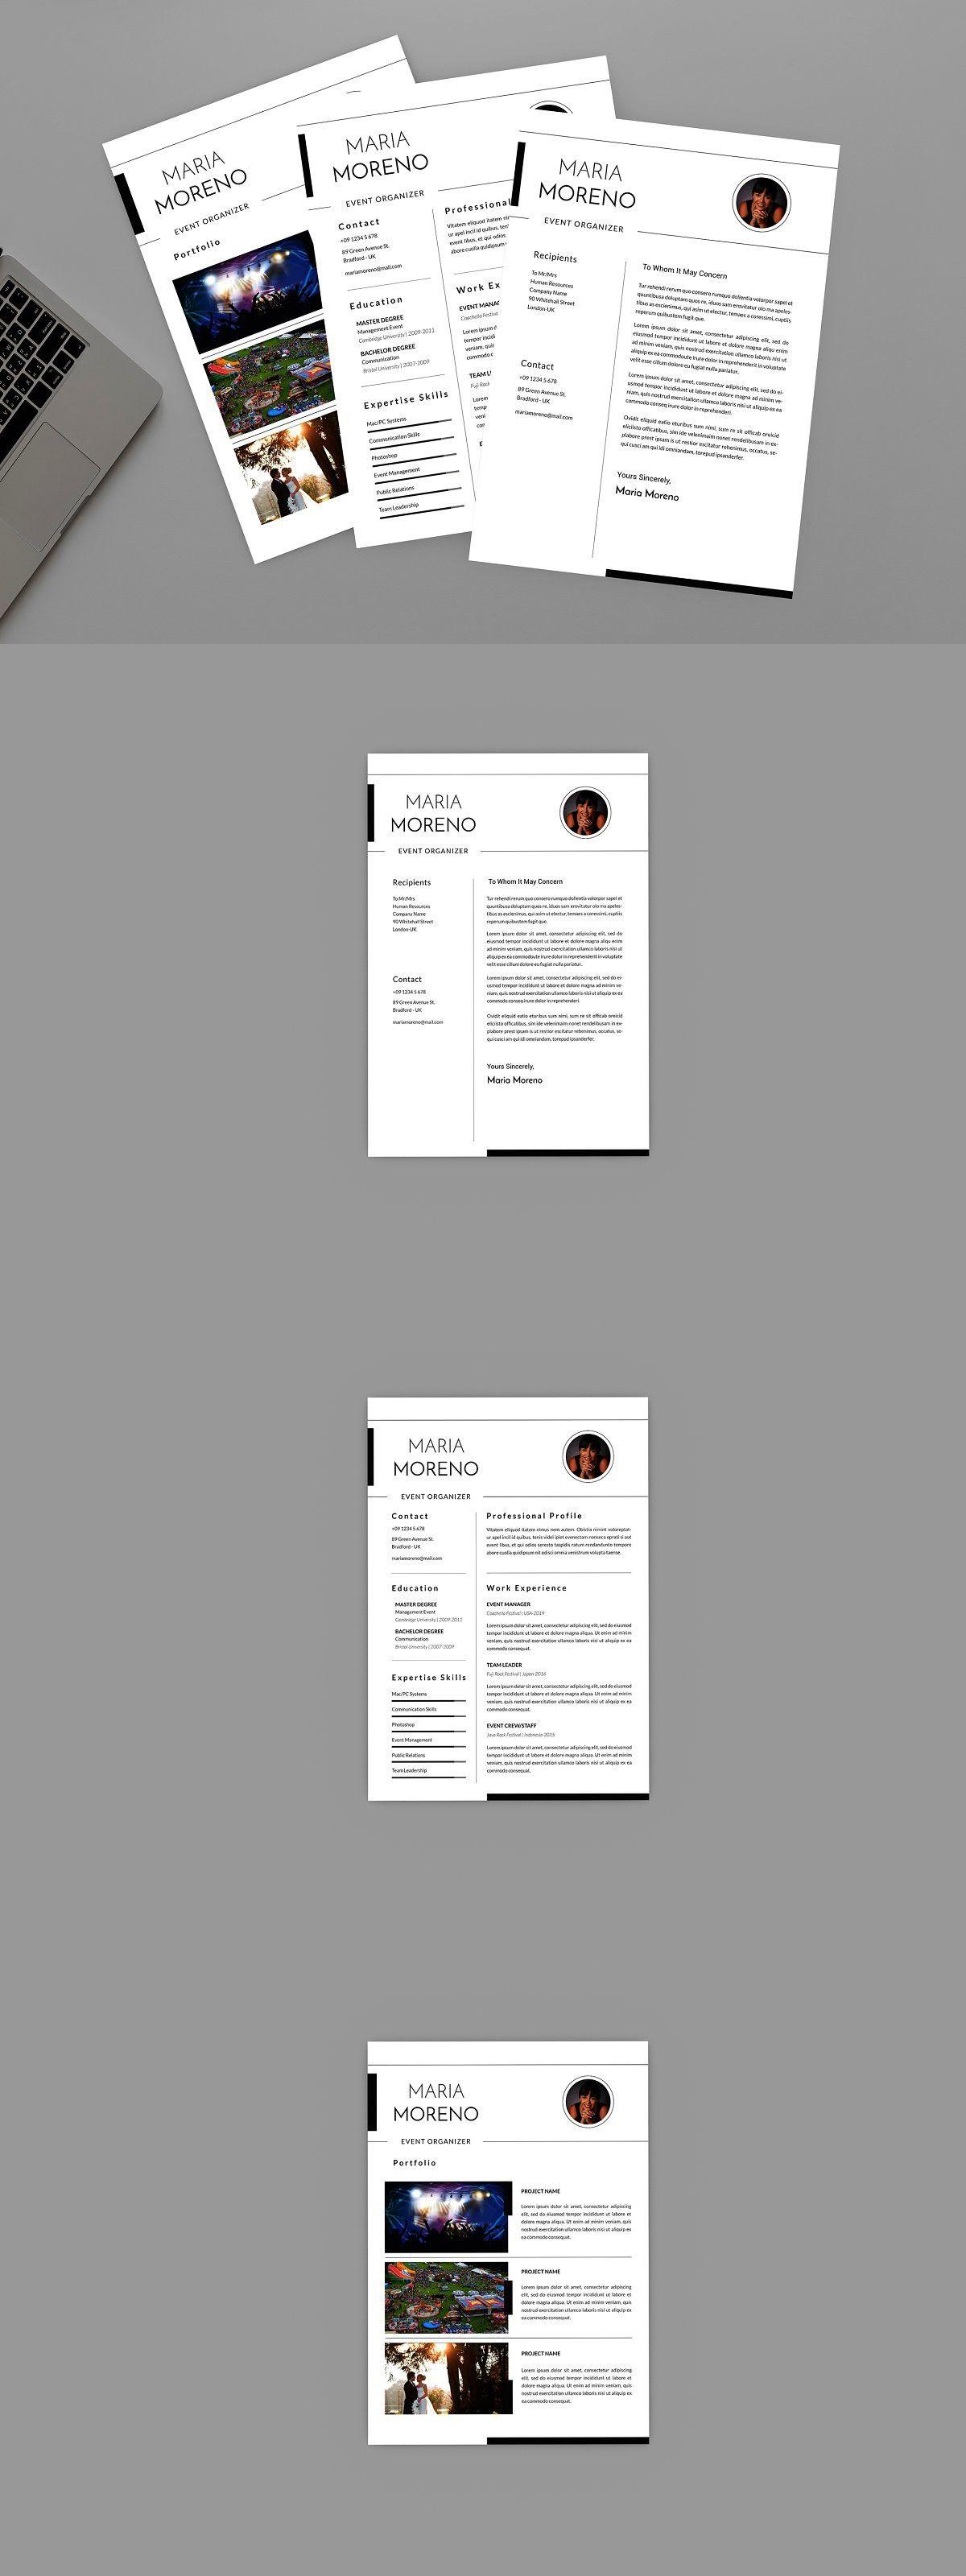 Event Moreno Resume Designer in 2020 Resume, Resume